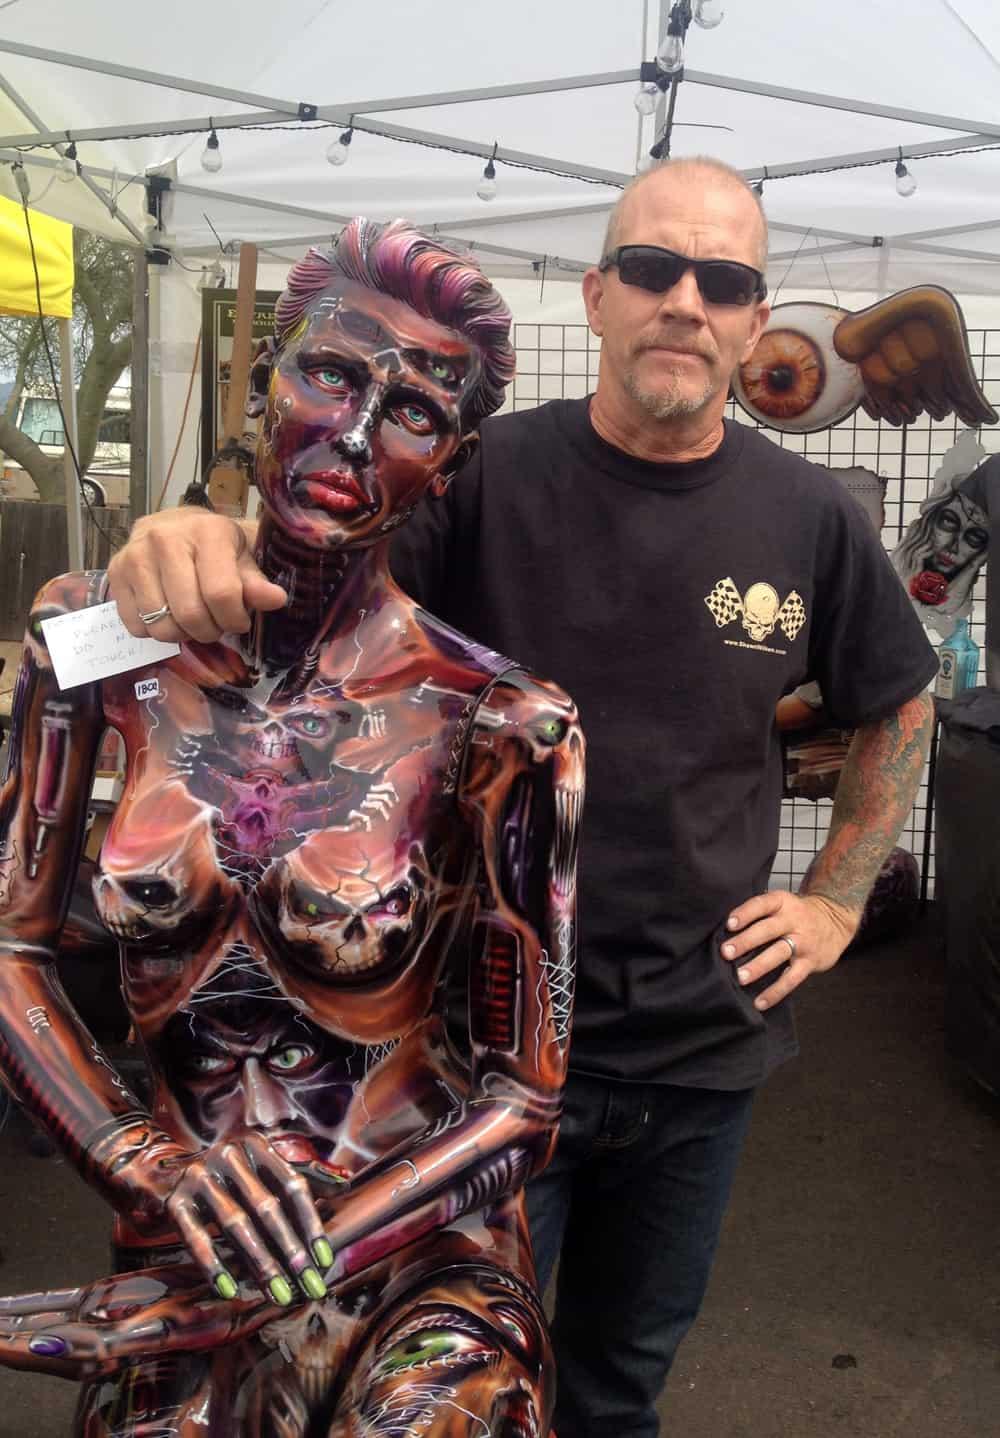 Shawn Wilken at AZ Bike Week 2014, Cave Creek, AZ